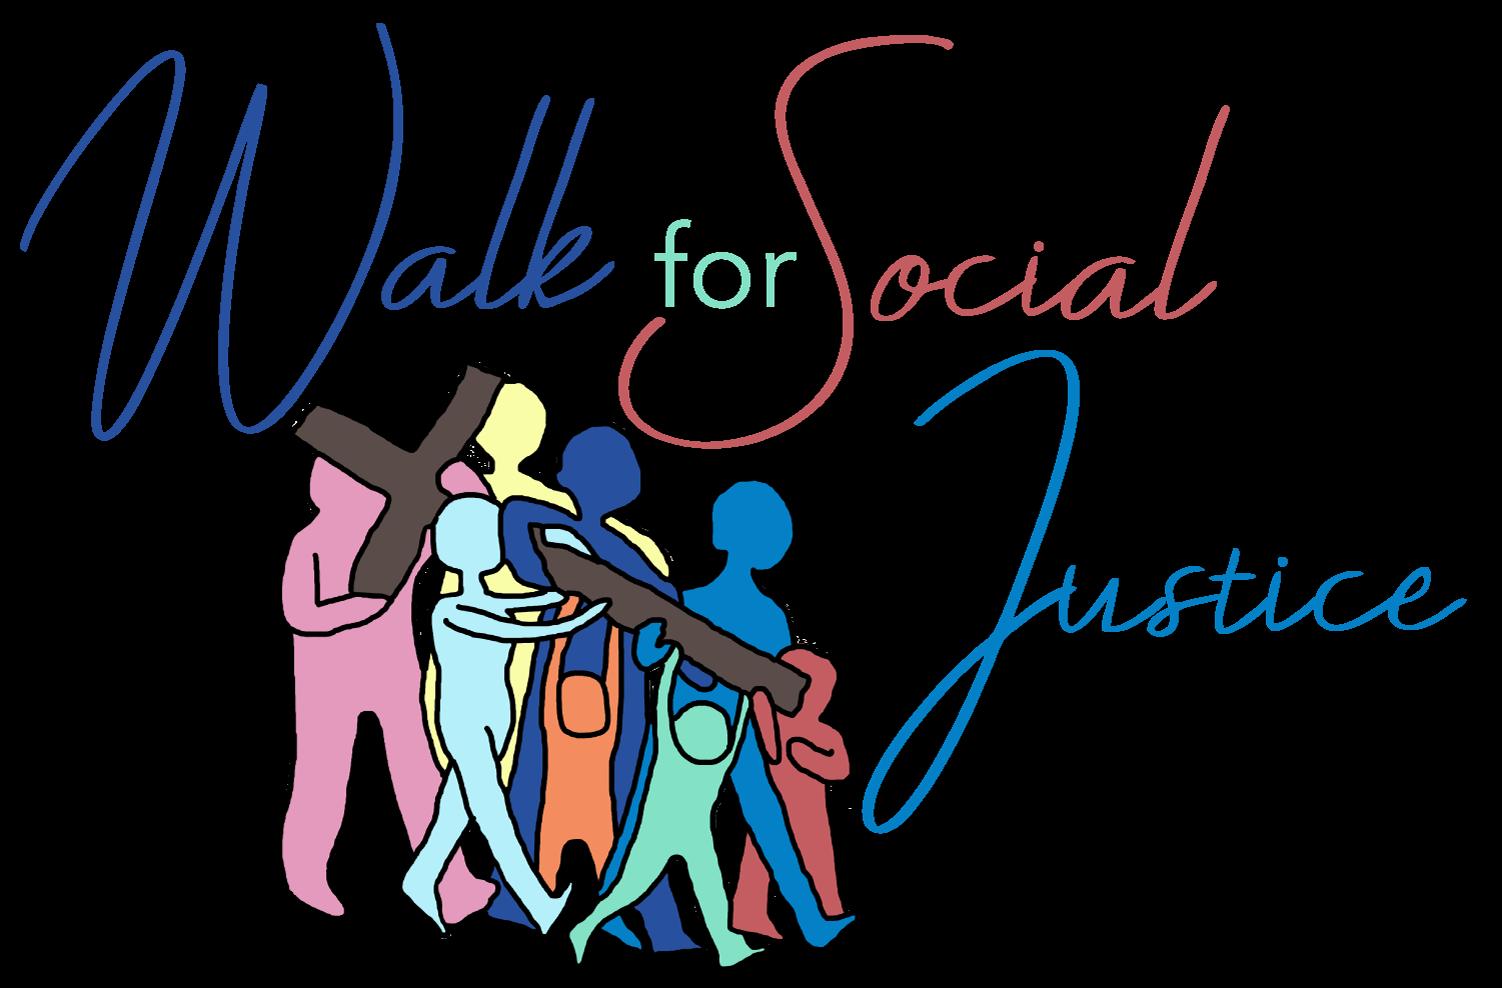 Clipart world social justice. Walk for simcoe muskoka